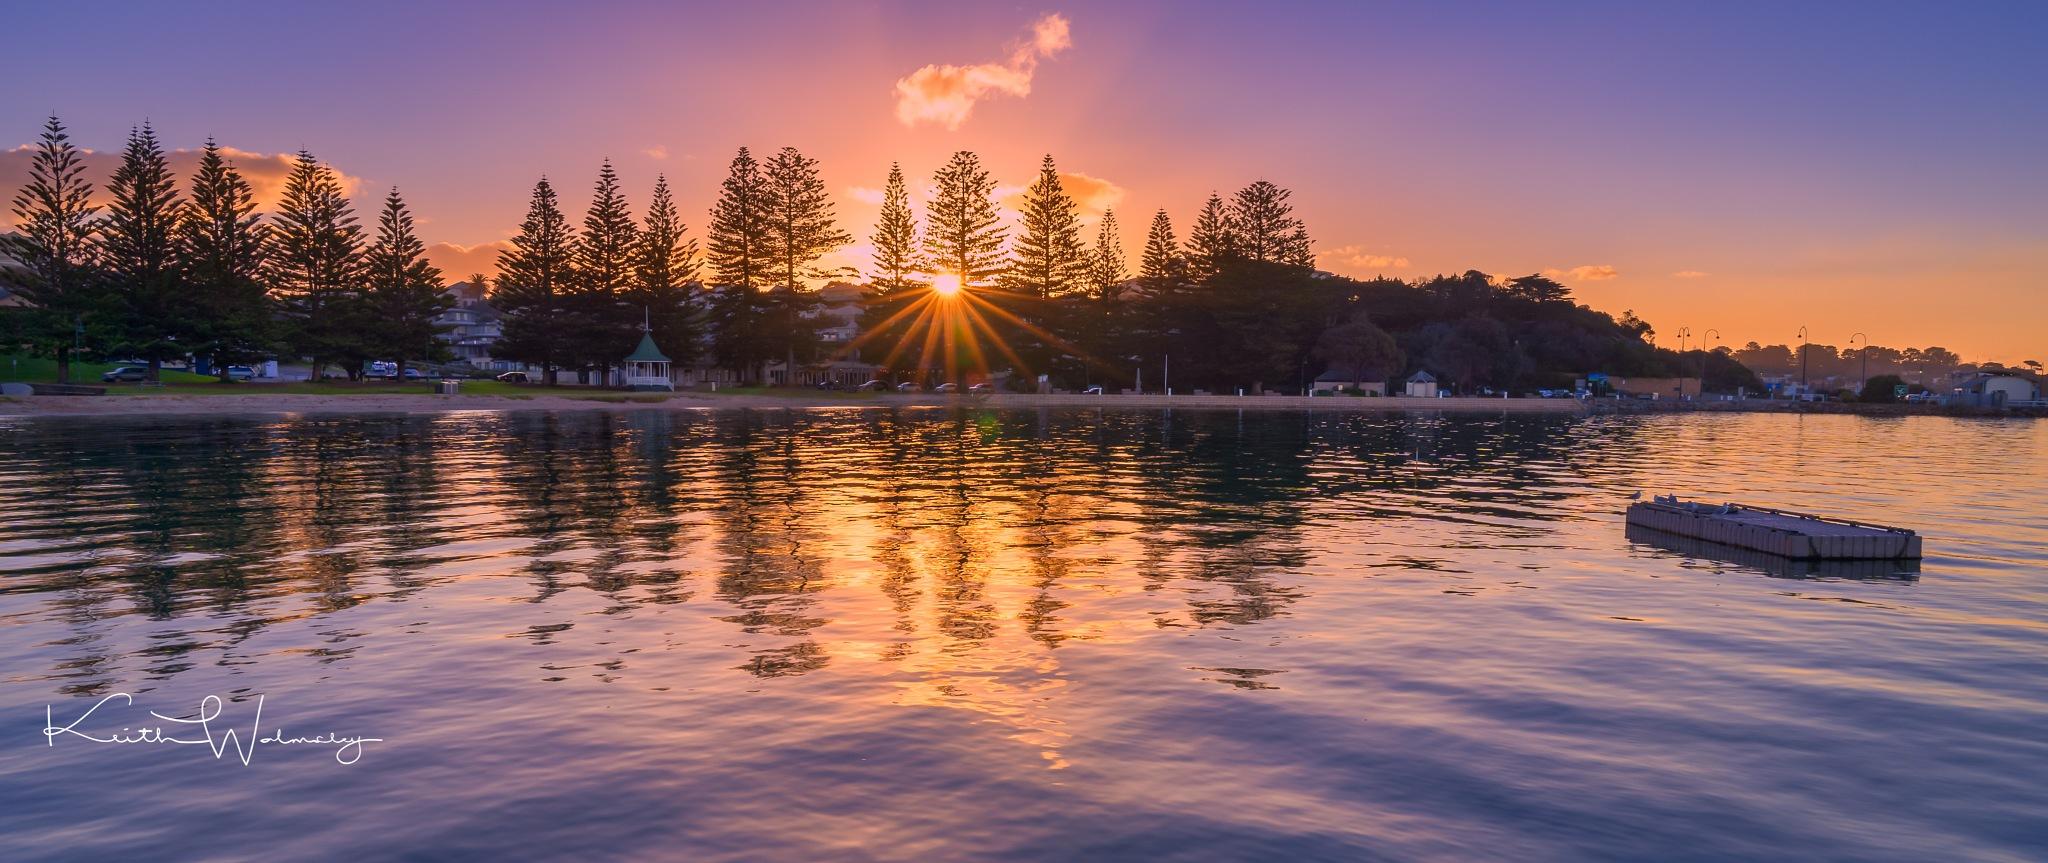 Sunset through the trees by keithhmw